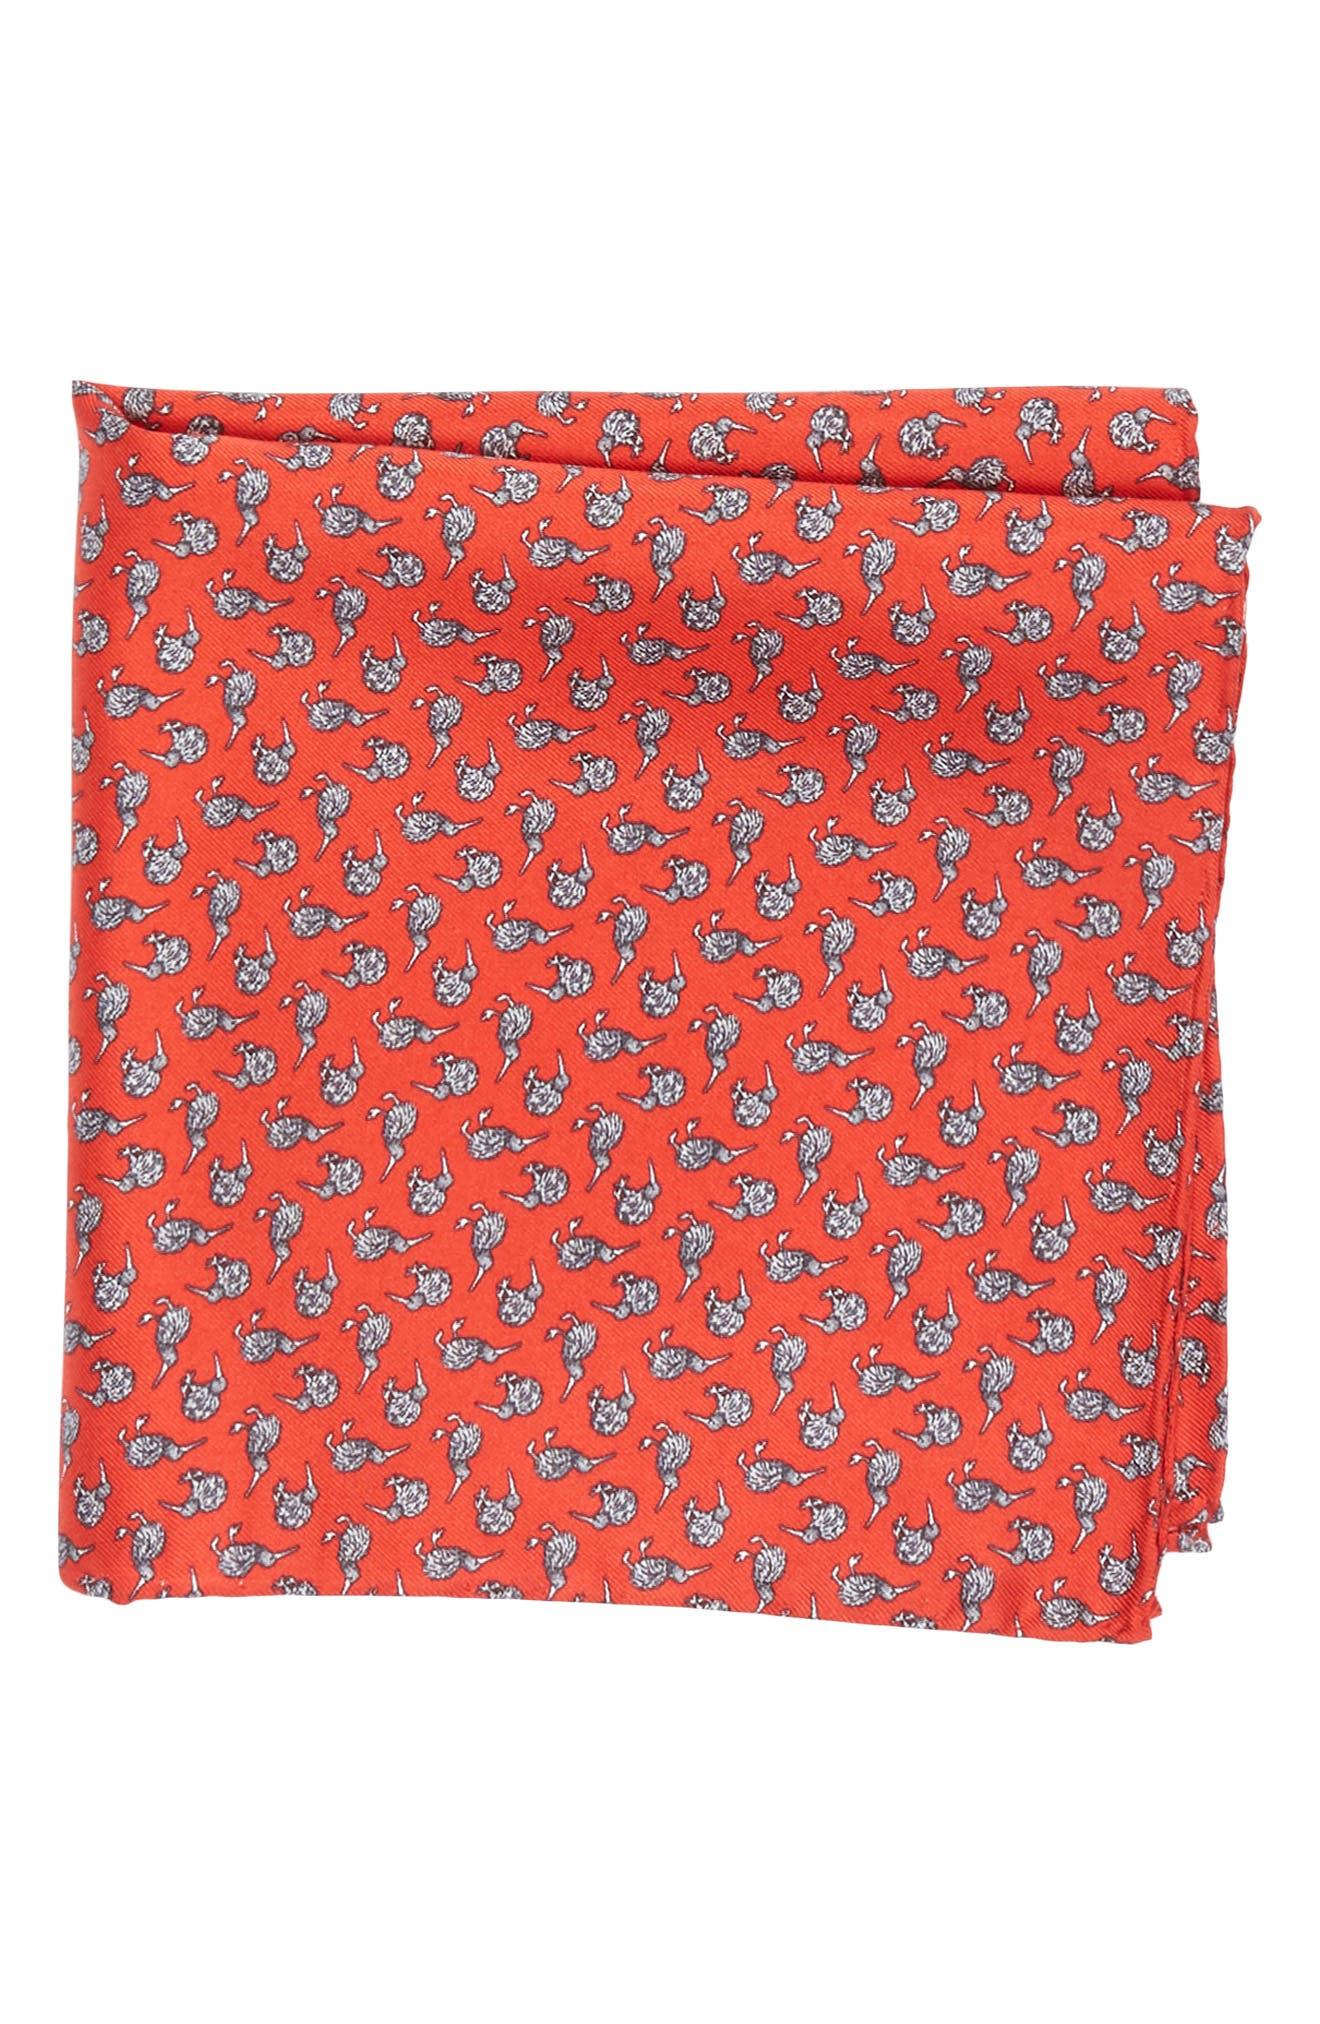 Cheeky Kiwi Silk Pocket Square,                         Main,                         color, 620